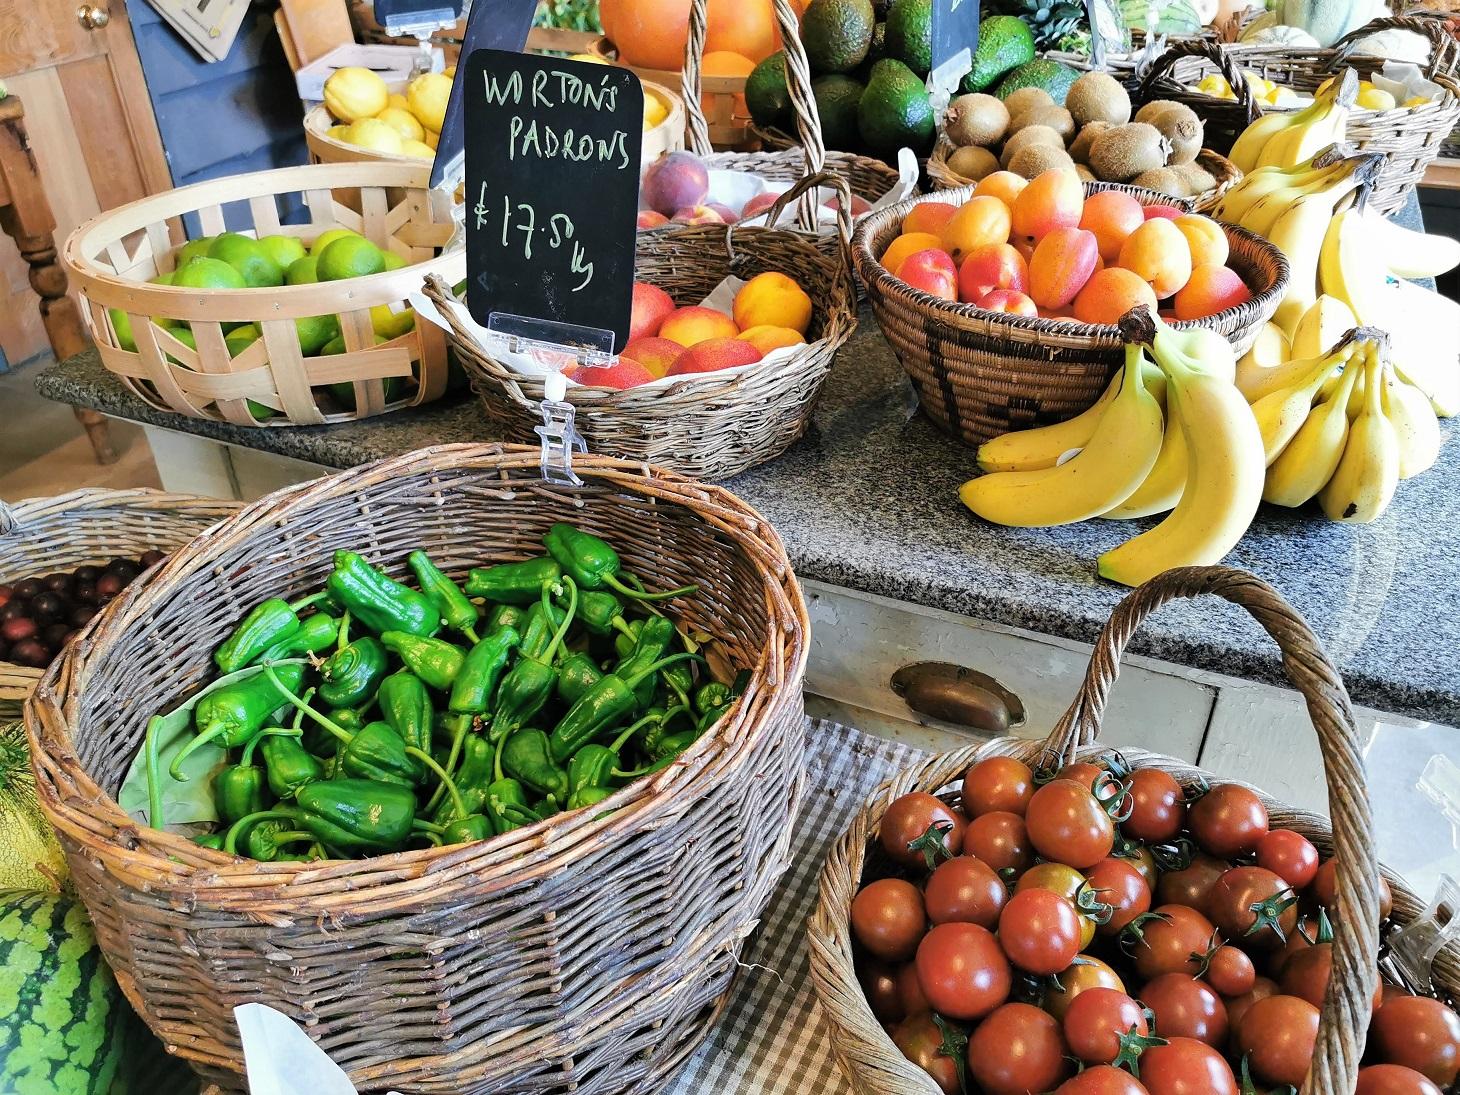 Worton Kitchen Garden Produce Farm Shop